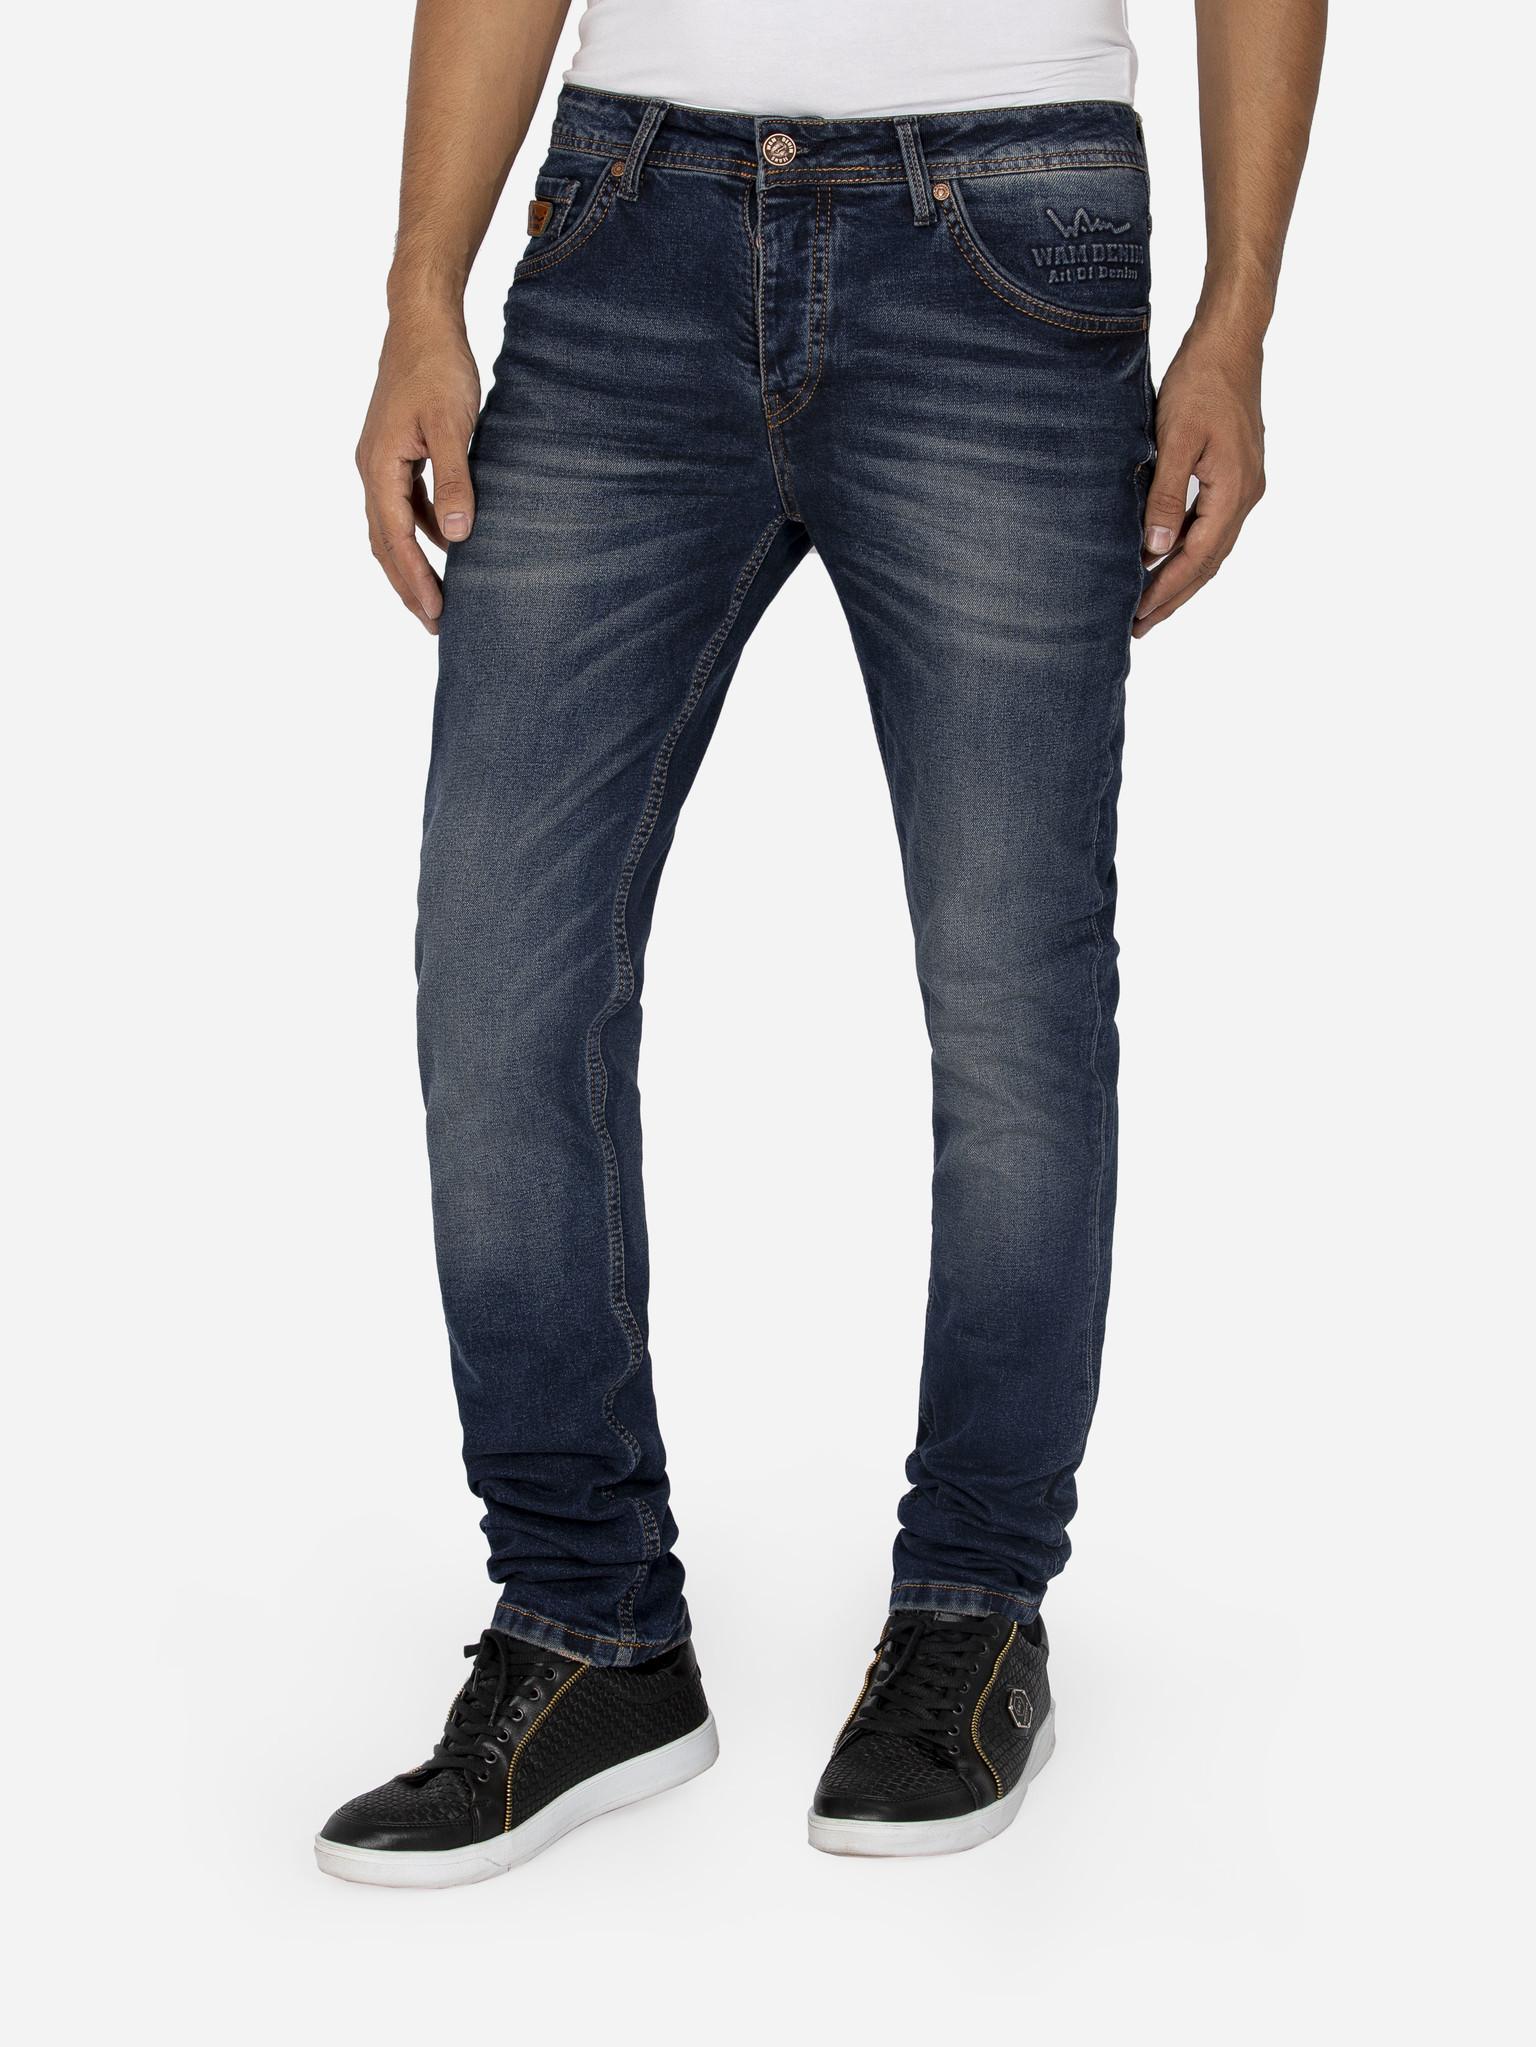 Wam Denim Jeans  Maat: 31/34